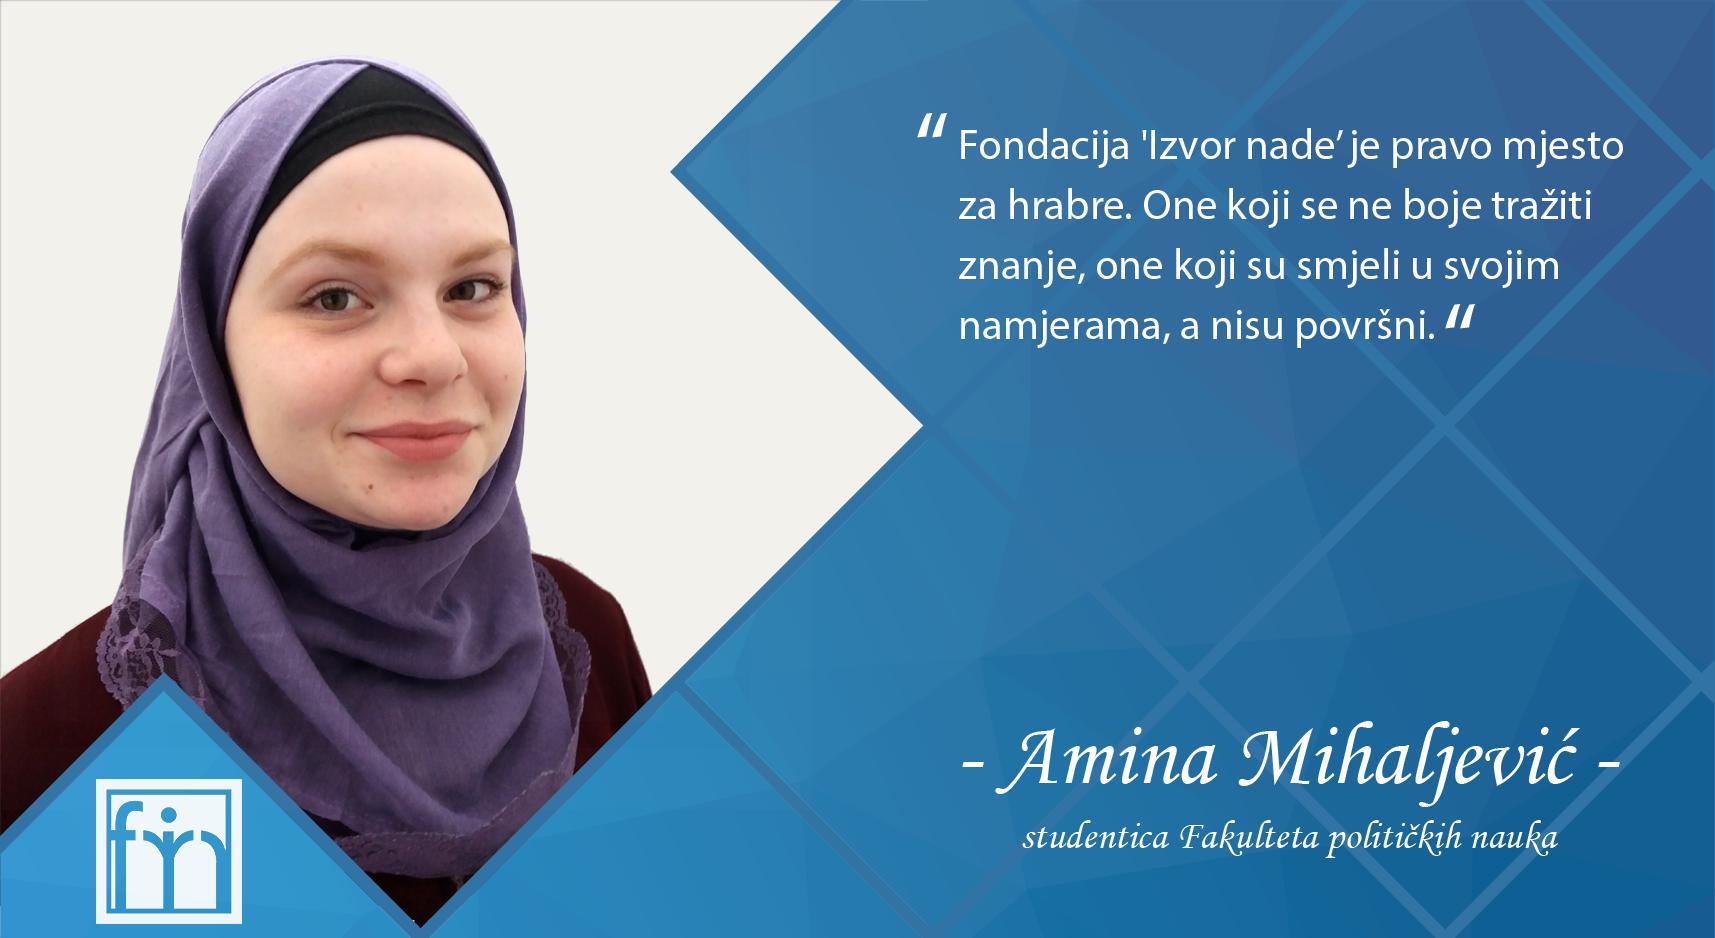 Amina_Mihaljevic_Izvor_nade